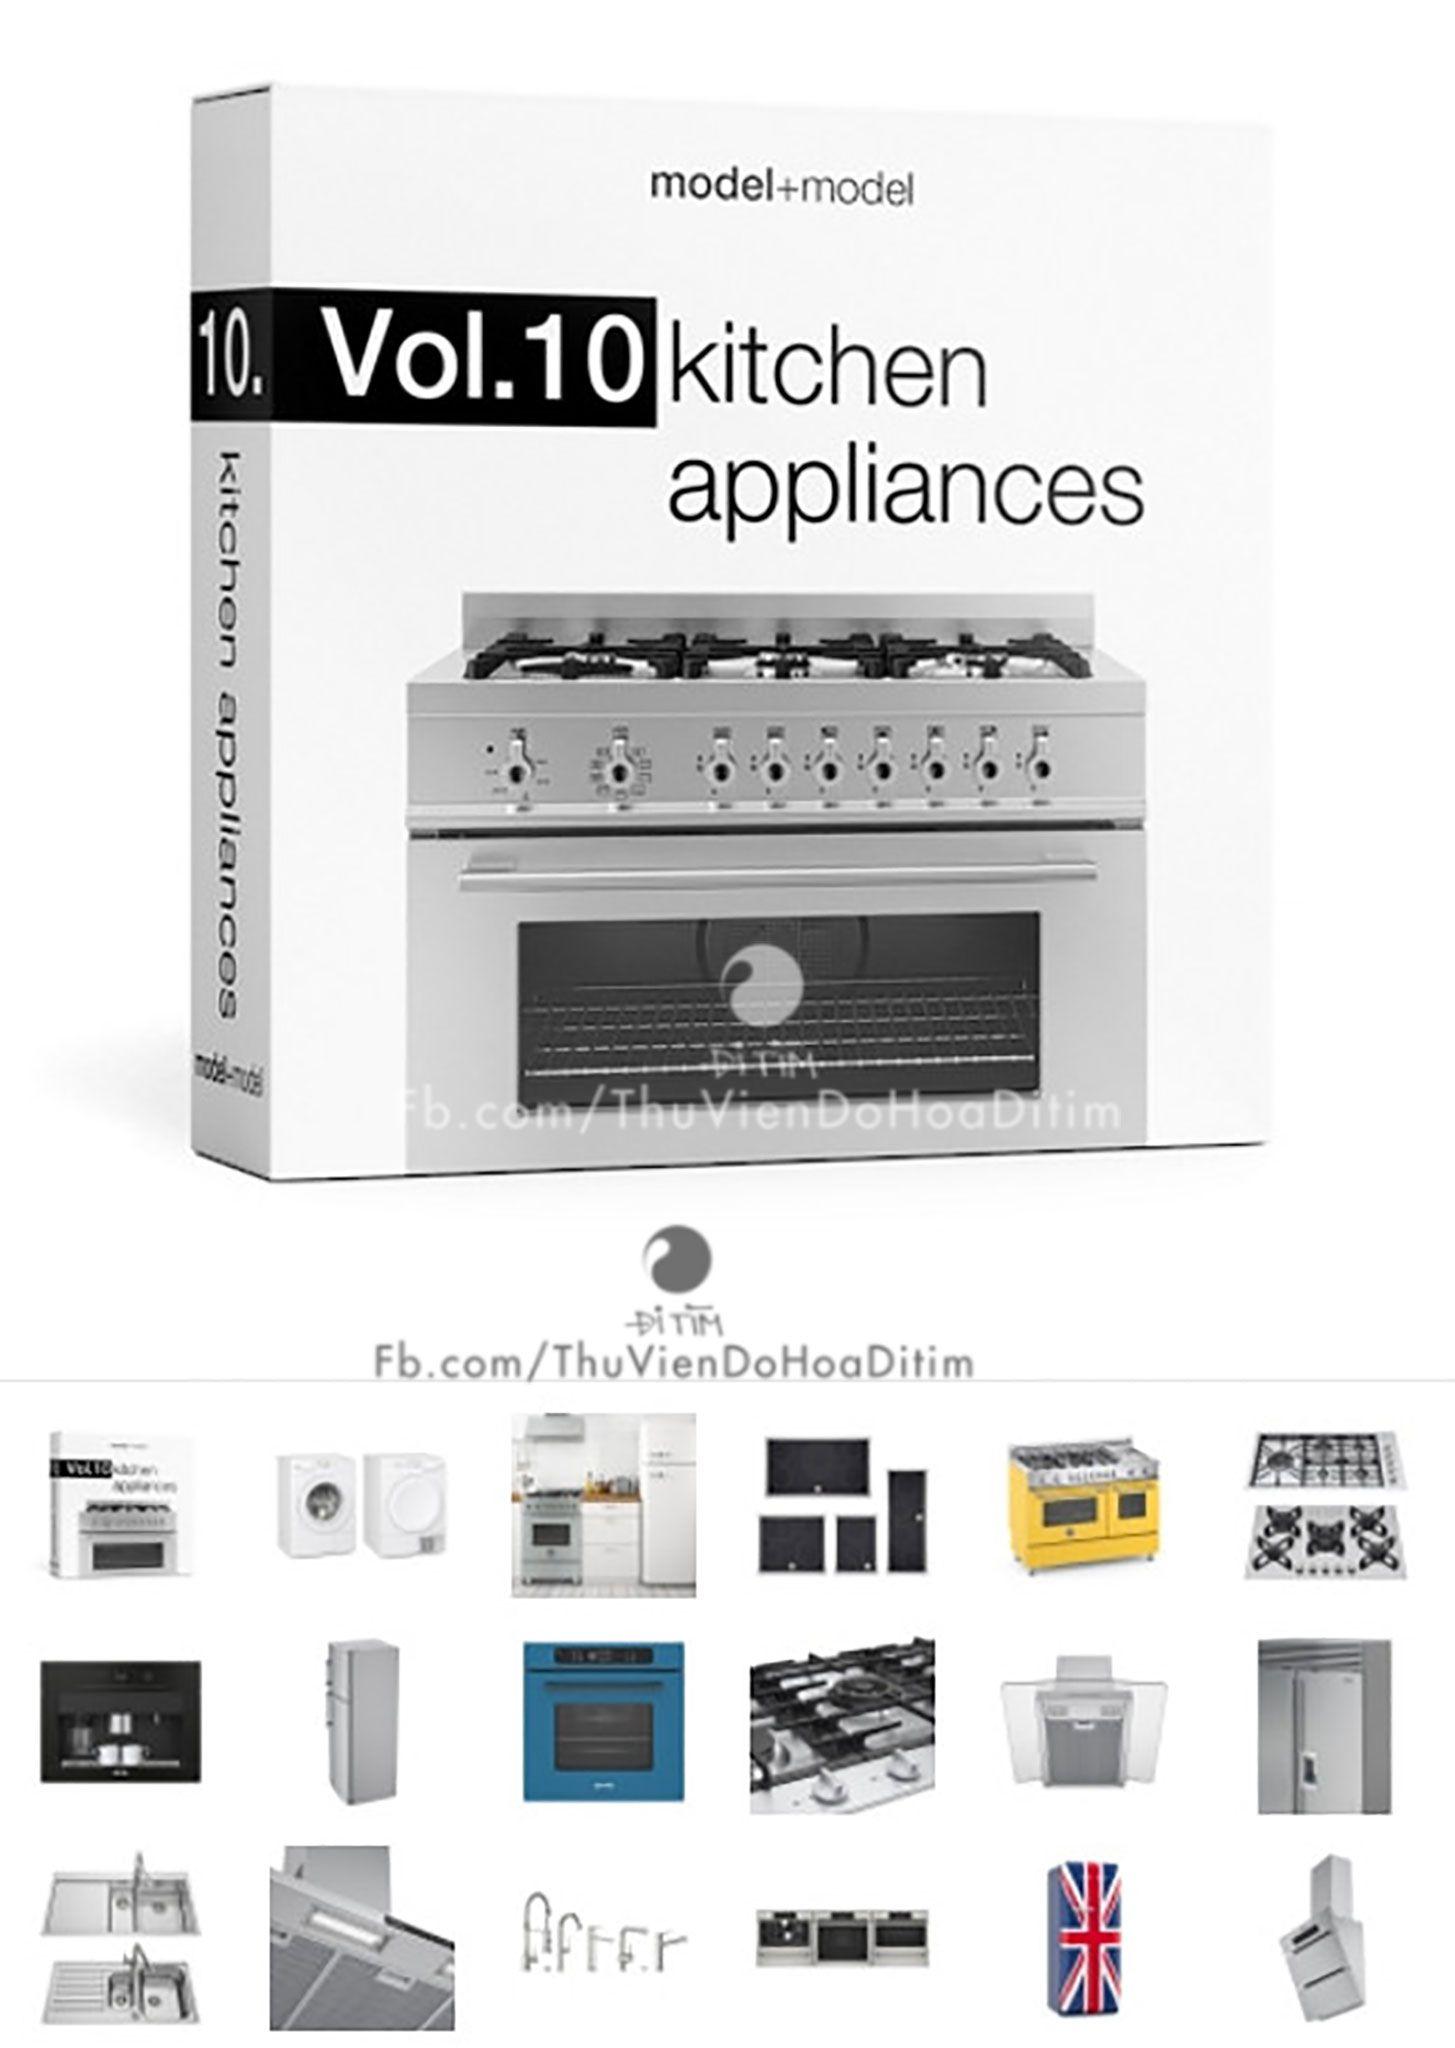 [ Models ] ModelplusModel Vol 10 Kitchen appliances